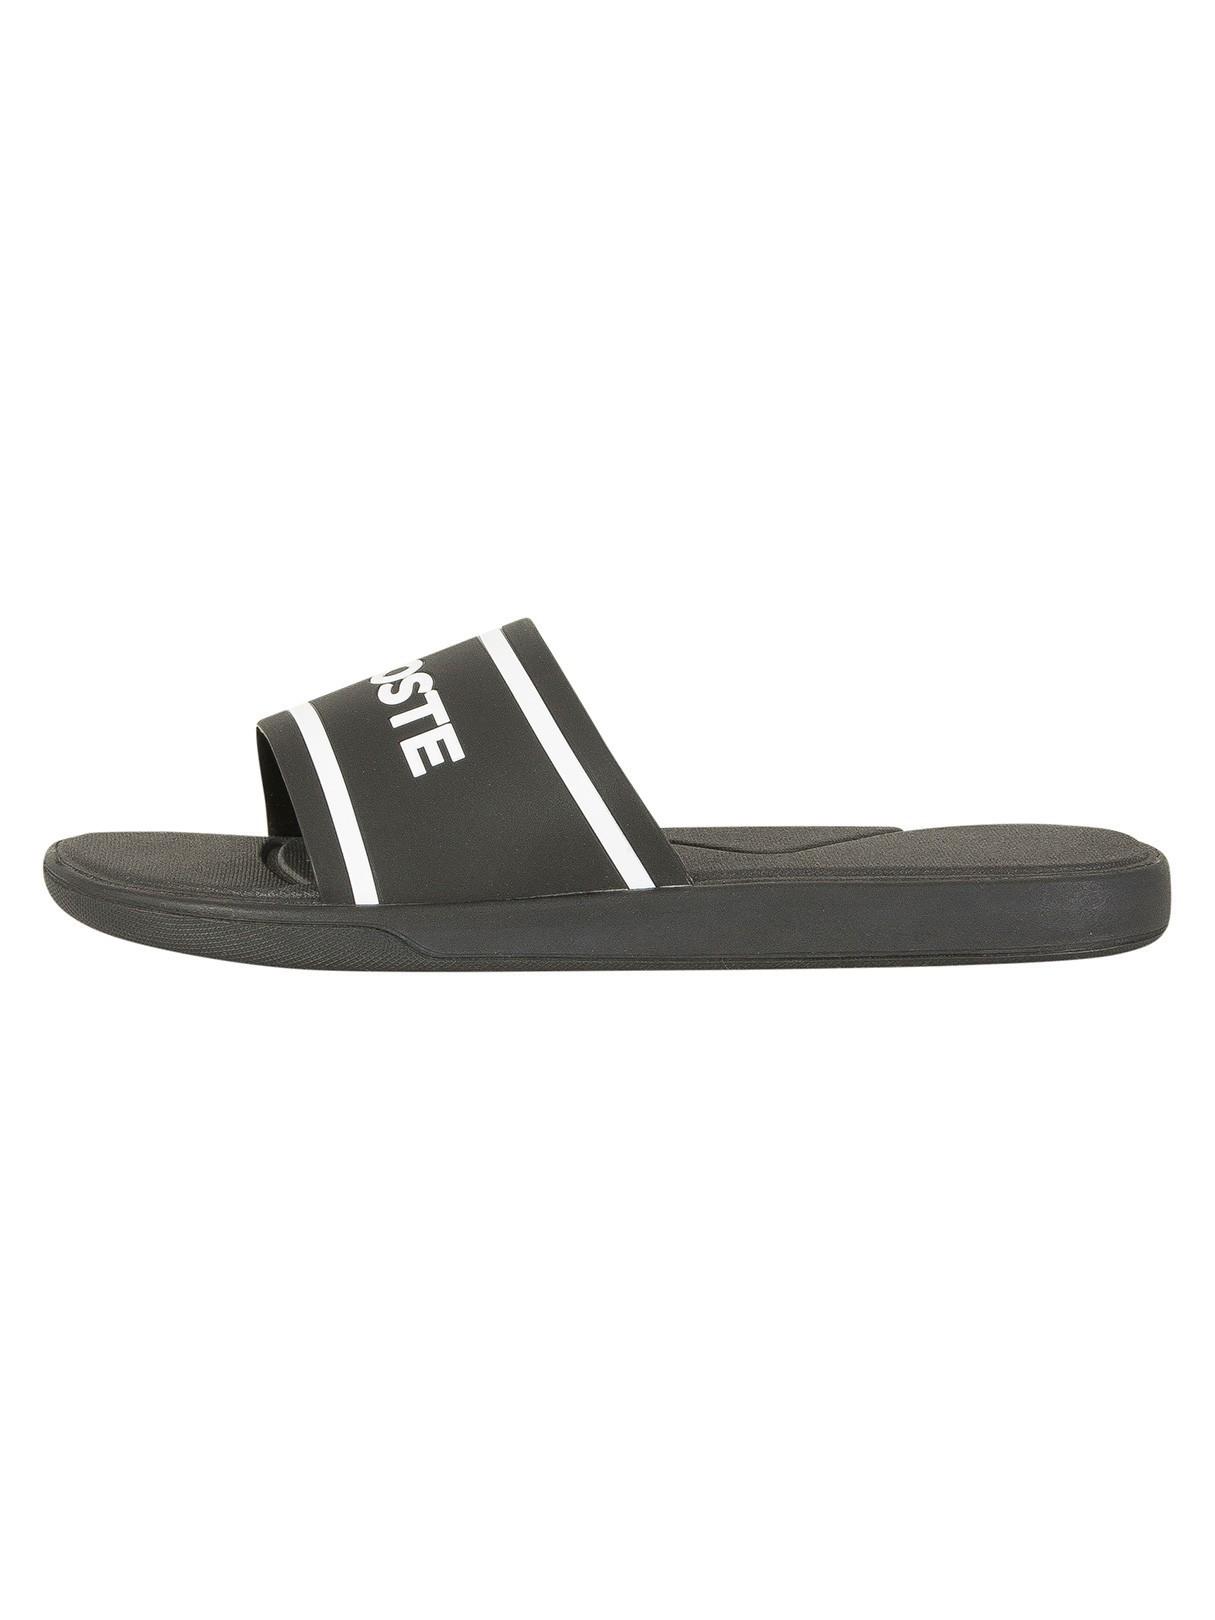 7b8a9bdcf703 Lacoste Black White L.30 Slide 118 3 CAM Flip Flops